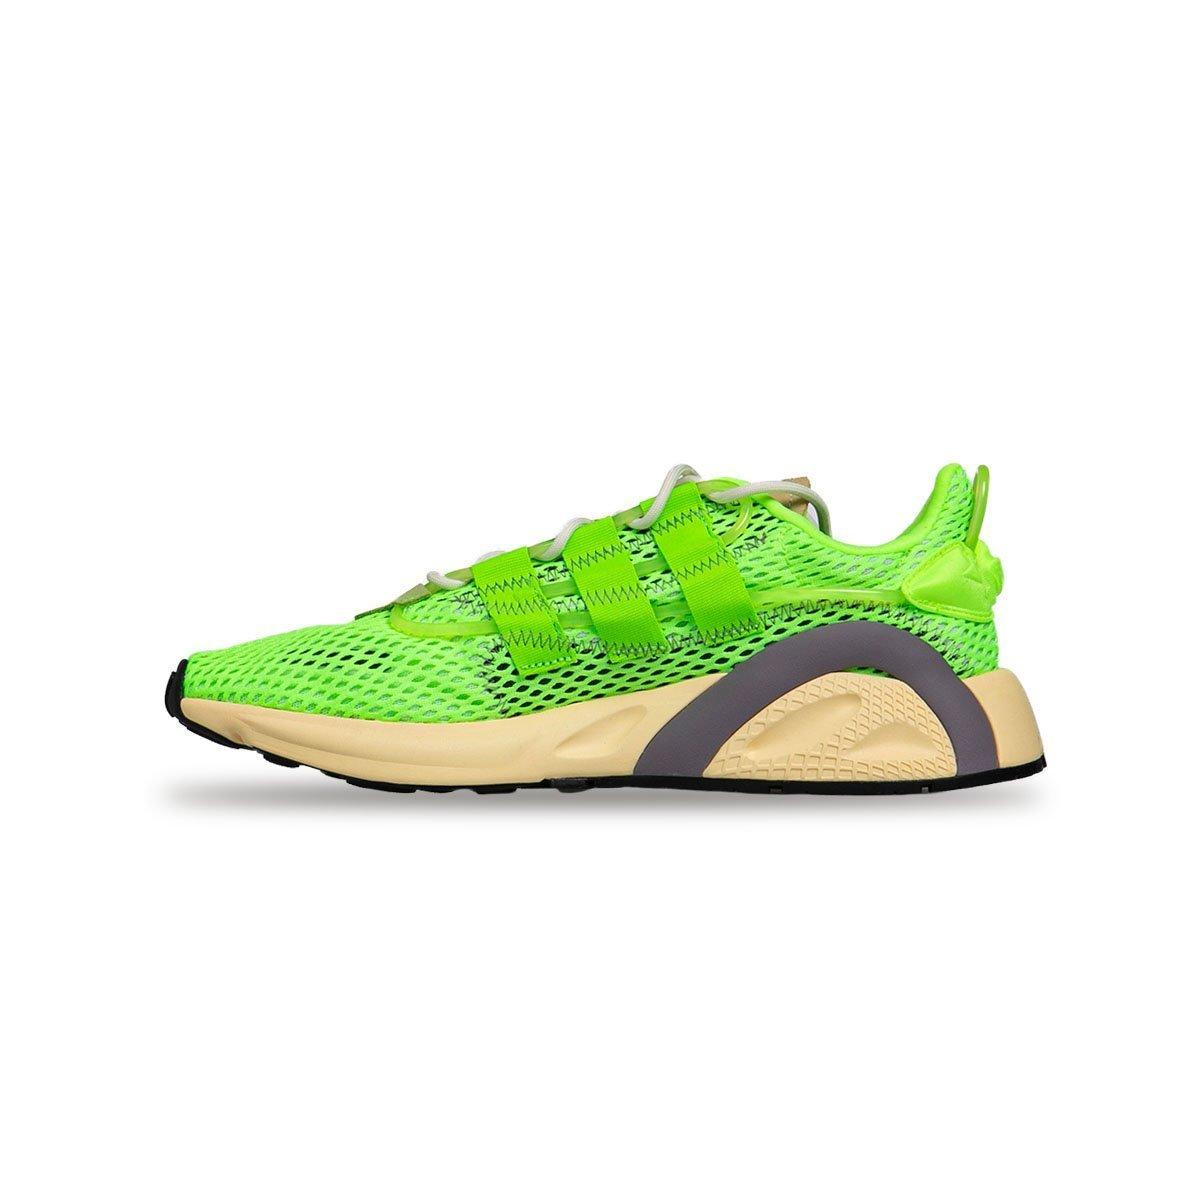 Sneakers Adidas Originals Lxcon Signal Green  Solar Green